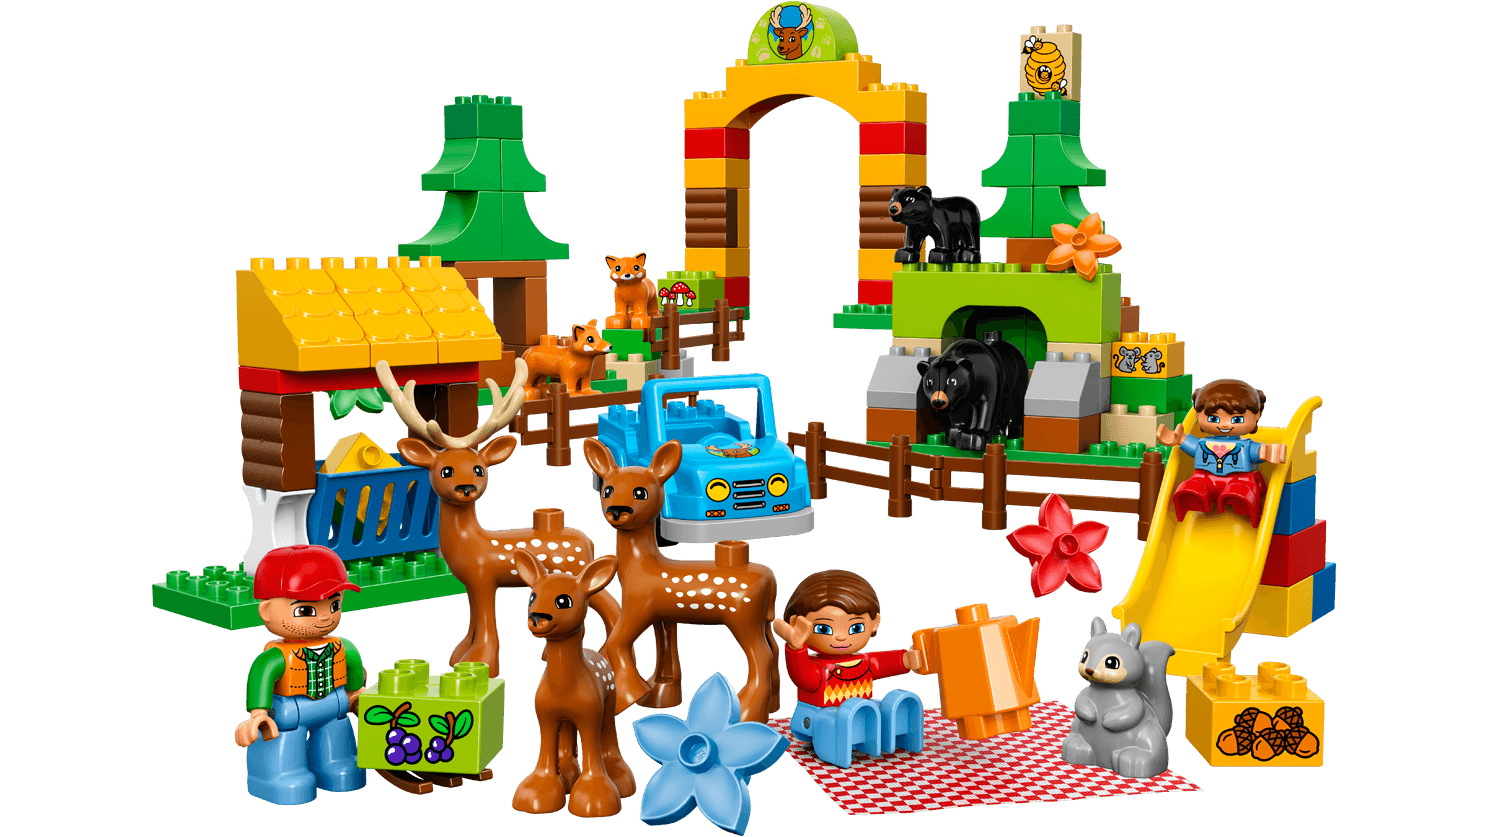 Includes child LEGO DUPLO fig